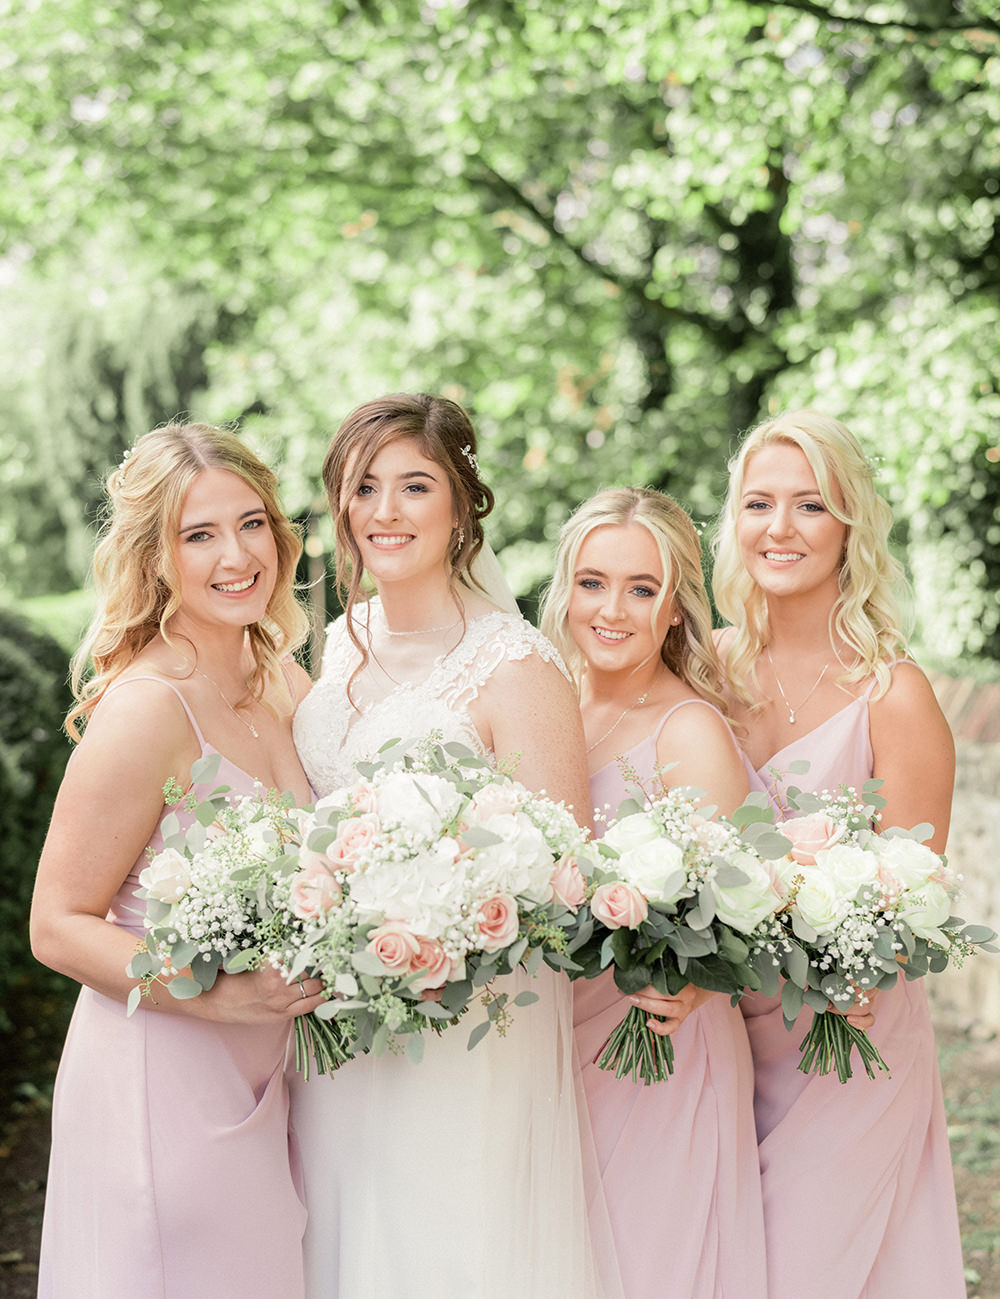 Long Pink Bridesmaid Bridesmaids Dress Dresses Beamish Hall Wedding Carn Patrick Photography